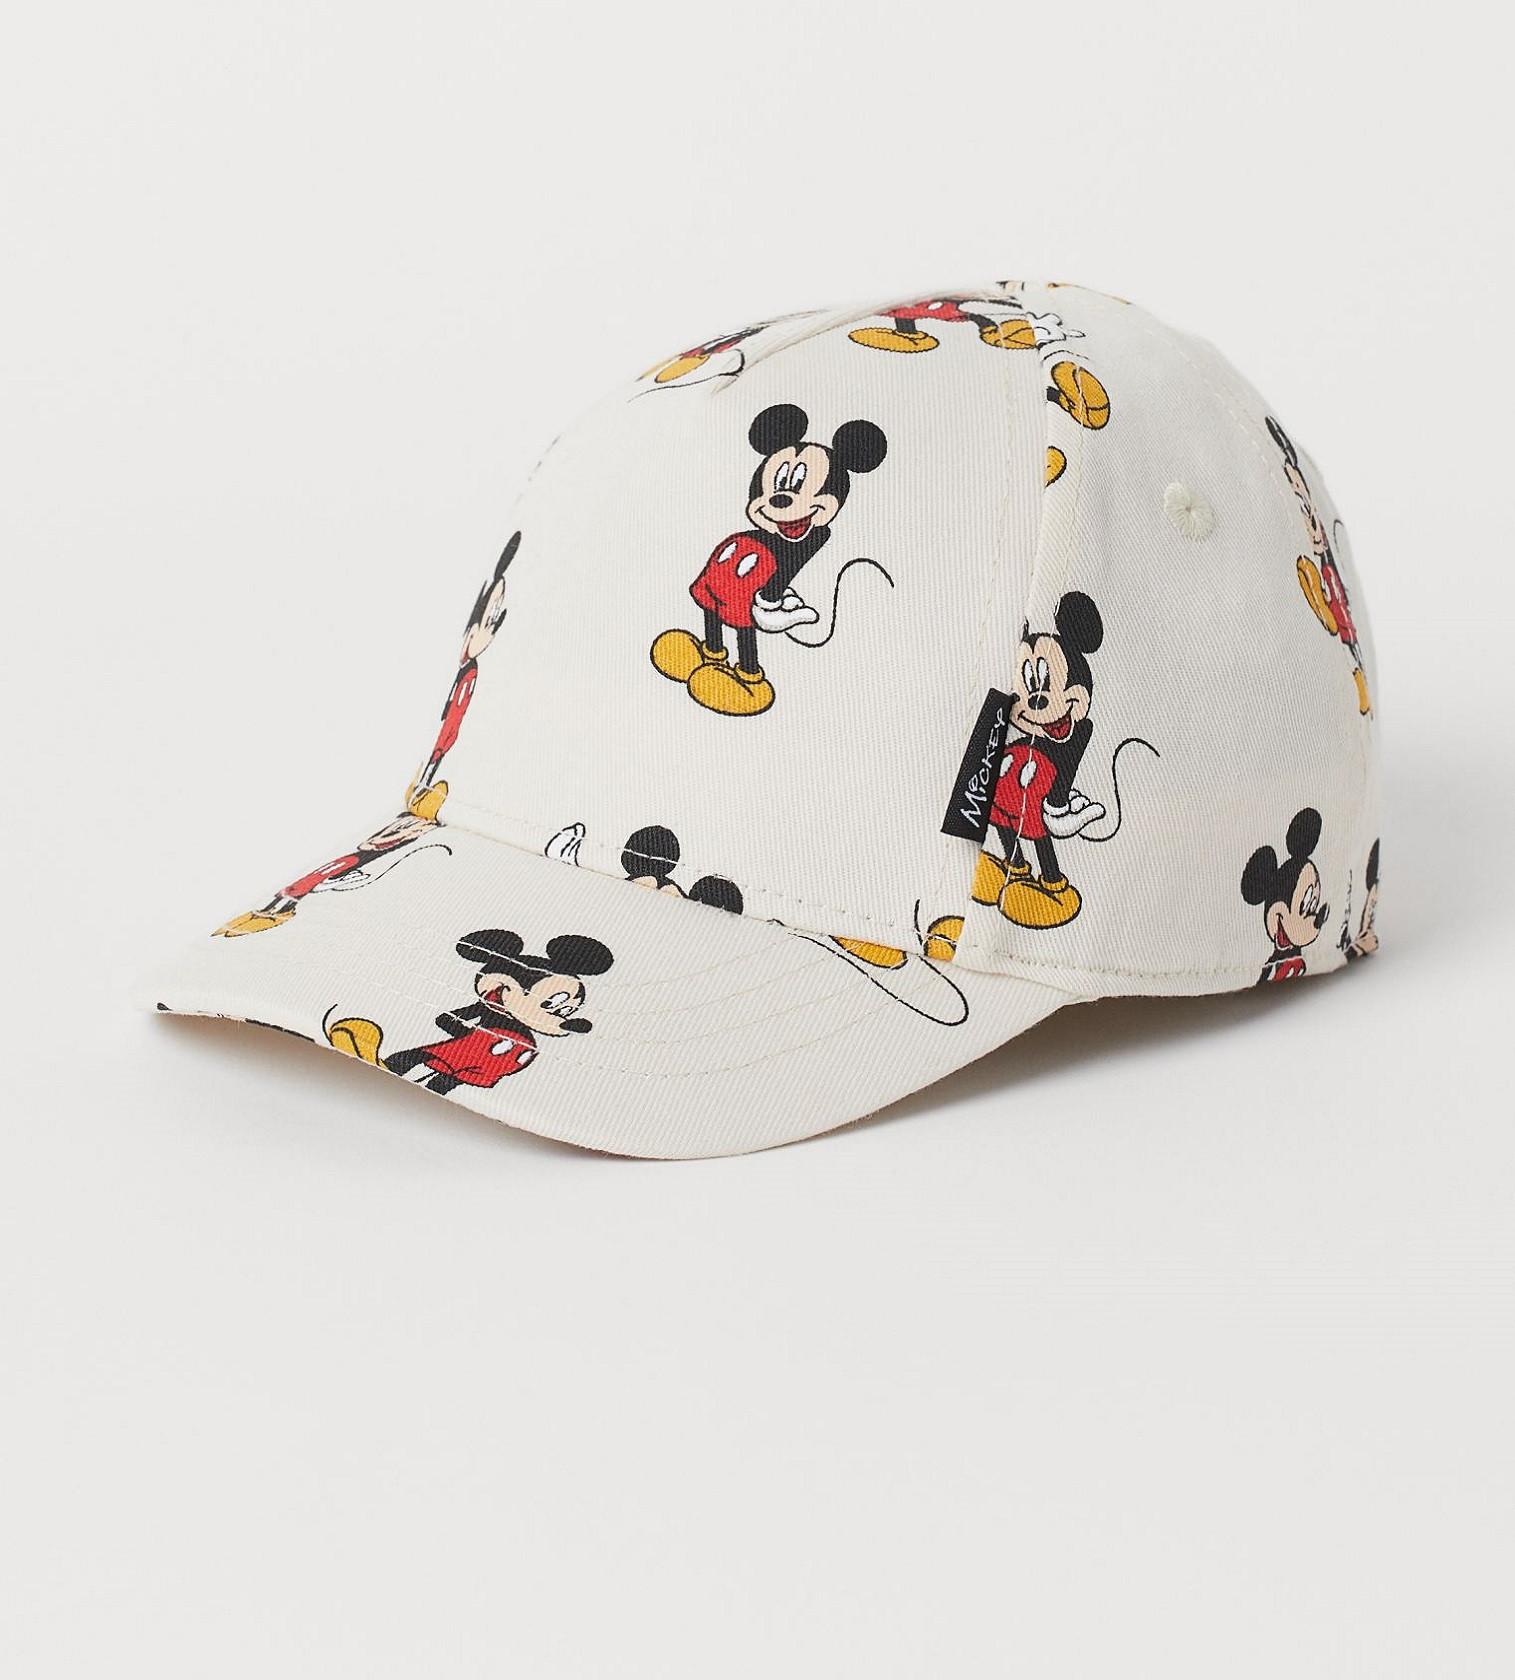 Купити Кепка H&M Natural white/Mickey Mouse - фото 1